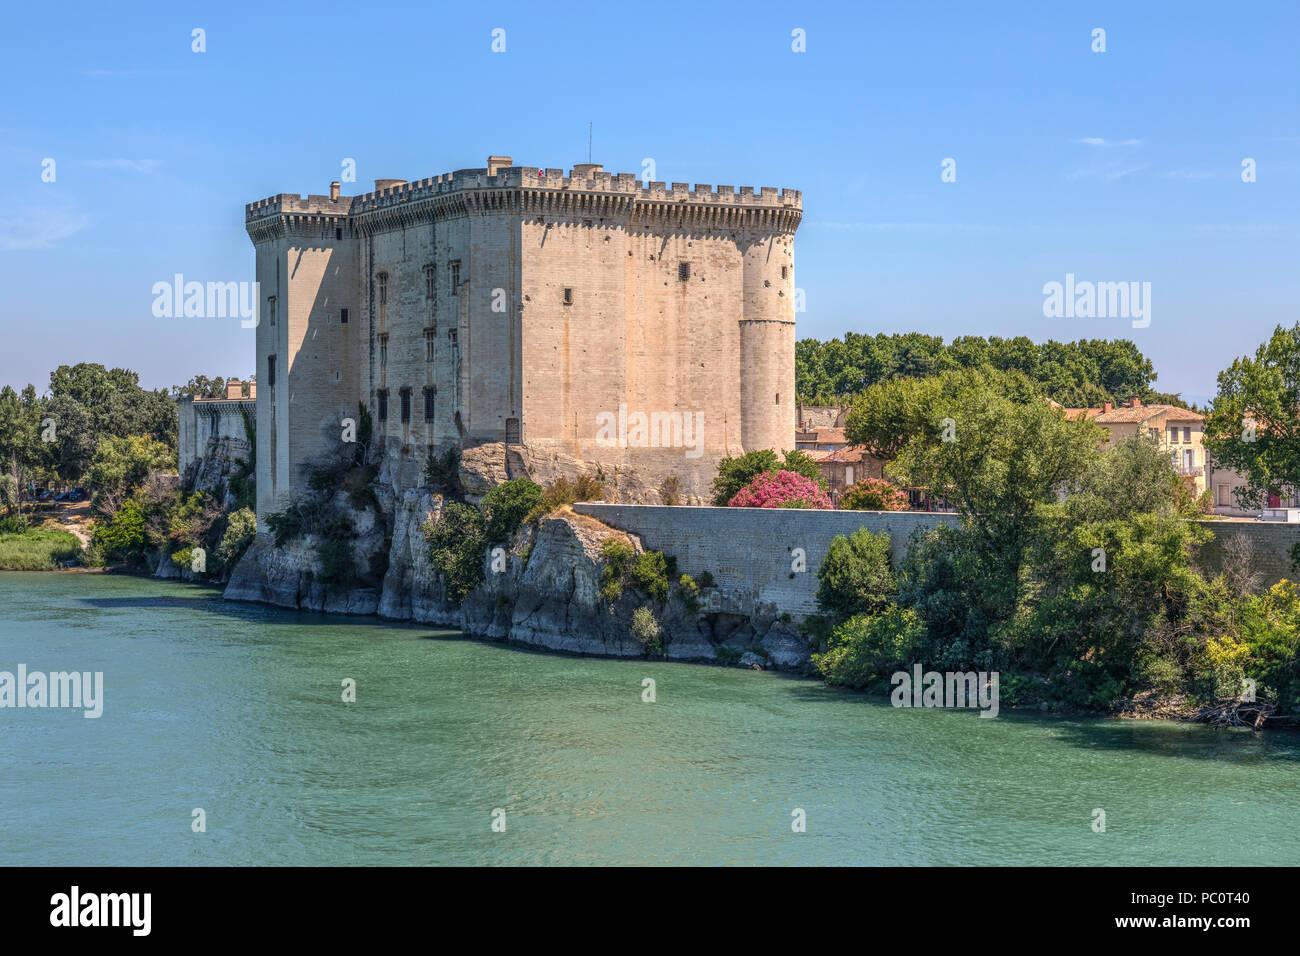 Chateau de Tarascon, Tarascon, Bouches-du-Rhone, Provence, France - Stock Image